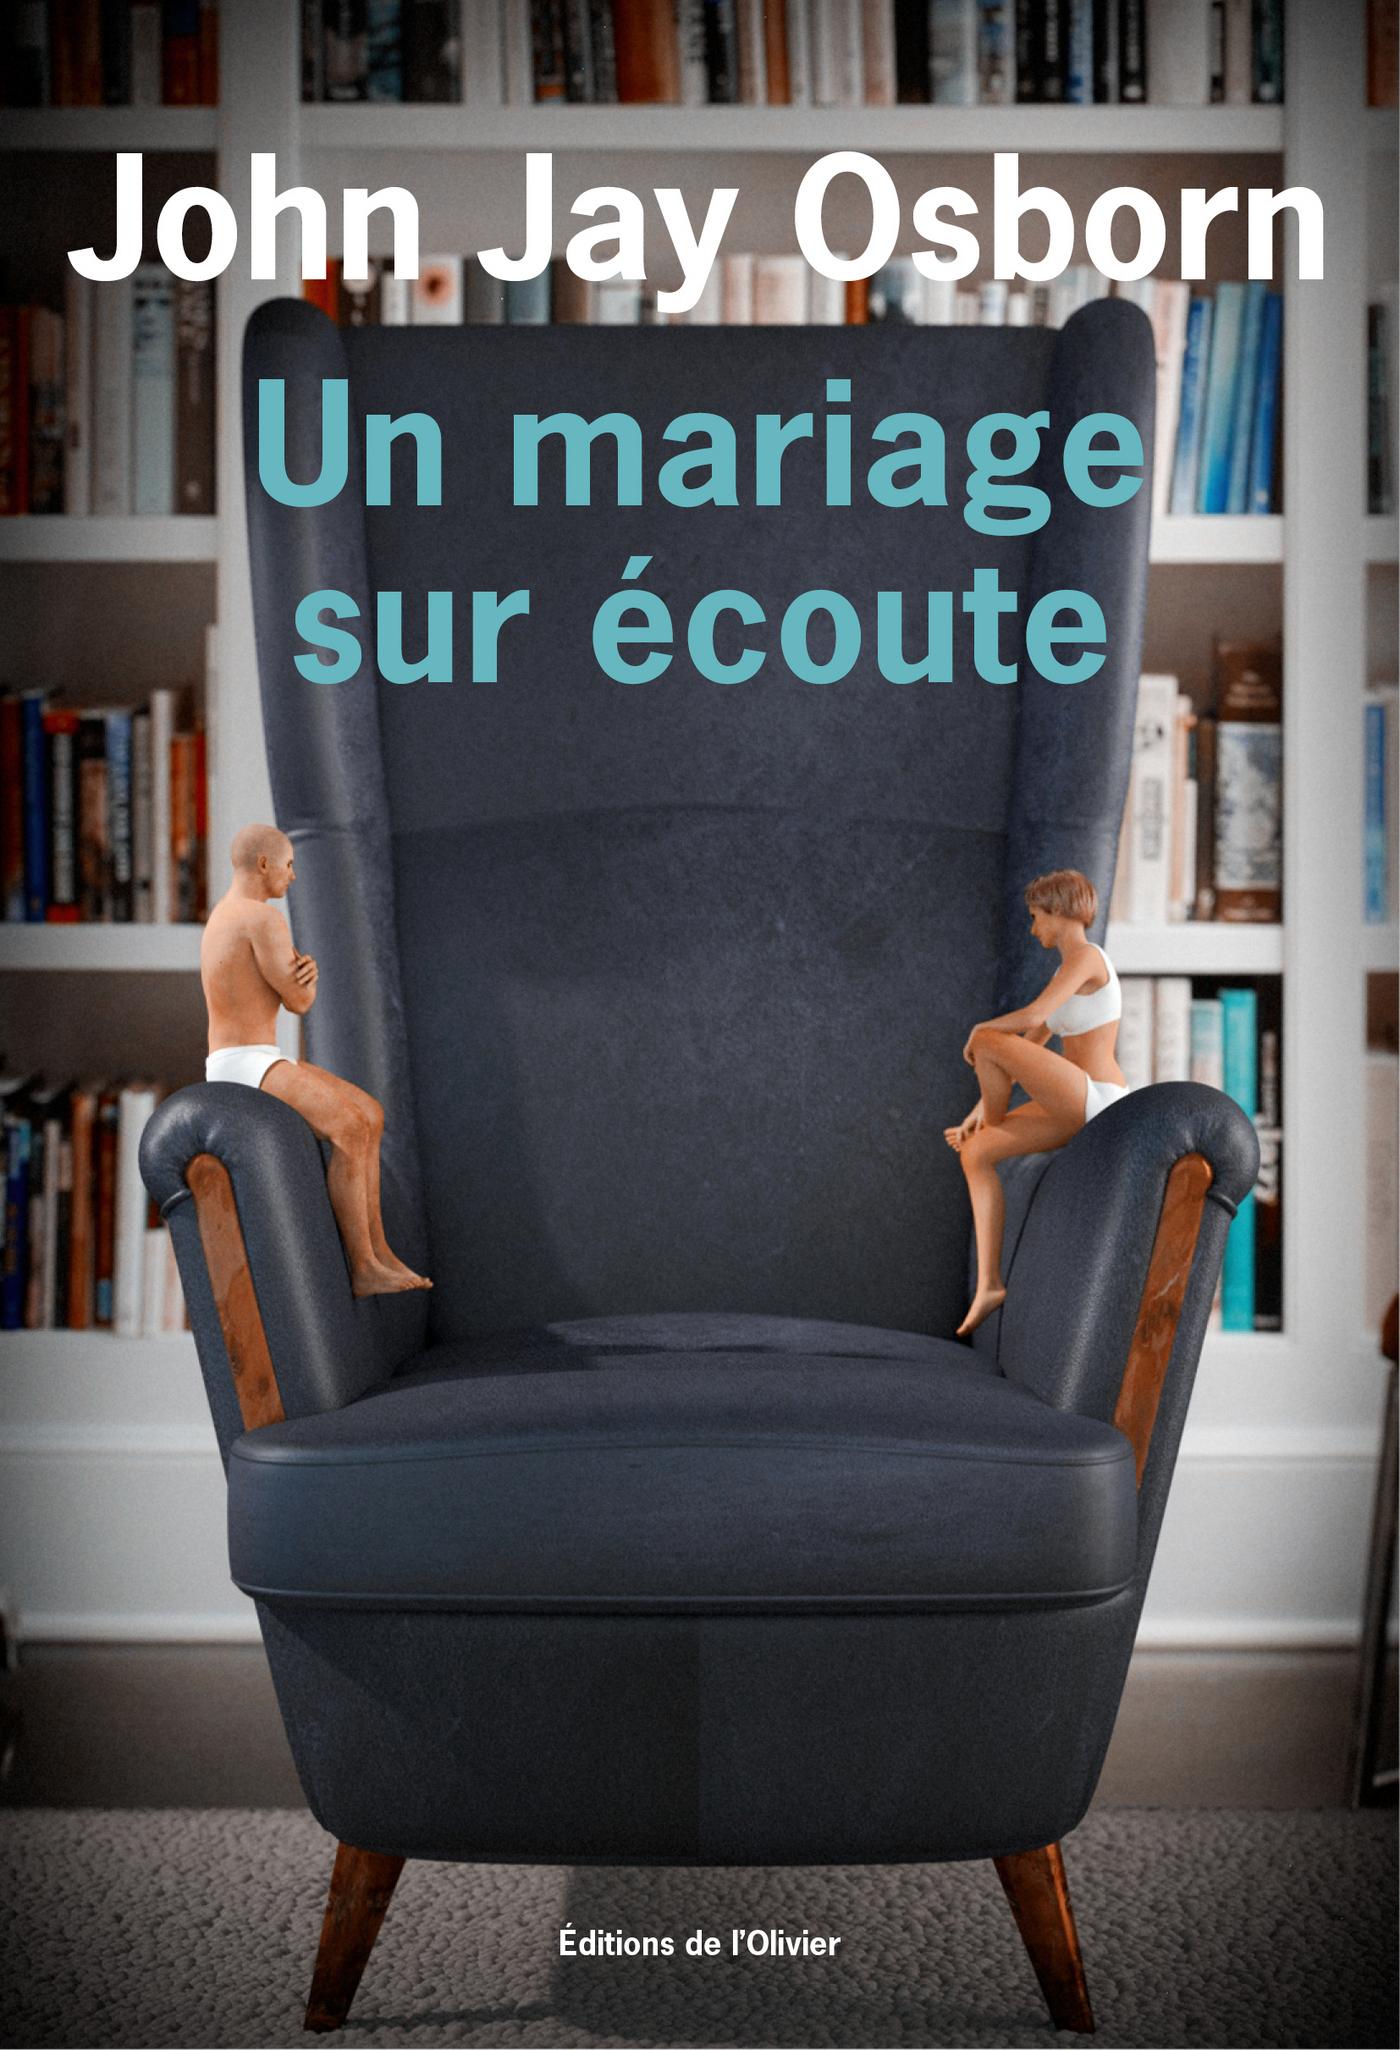 Un mariage sur écoute | Osborn, John jay